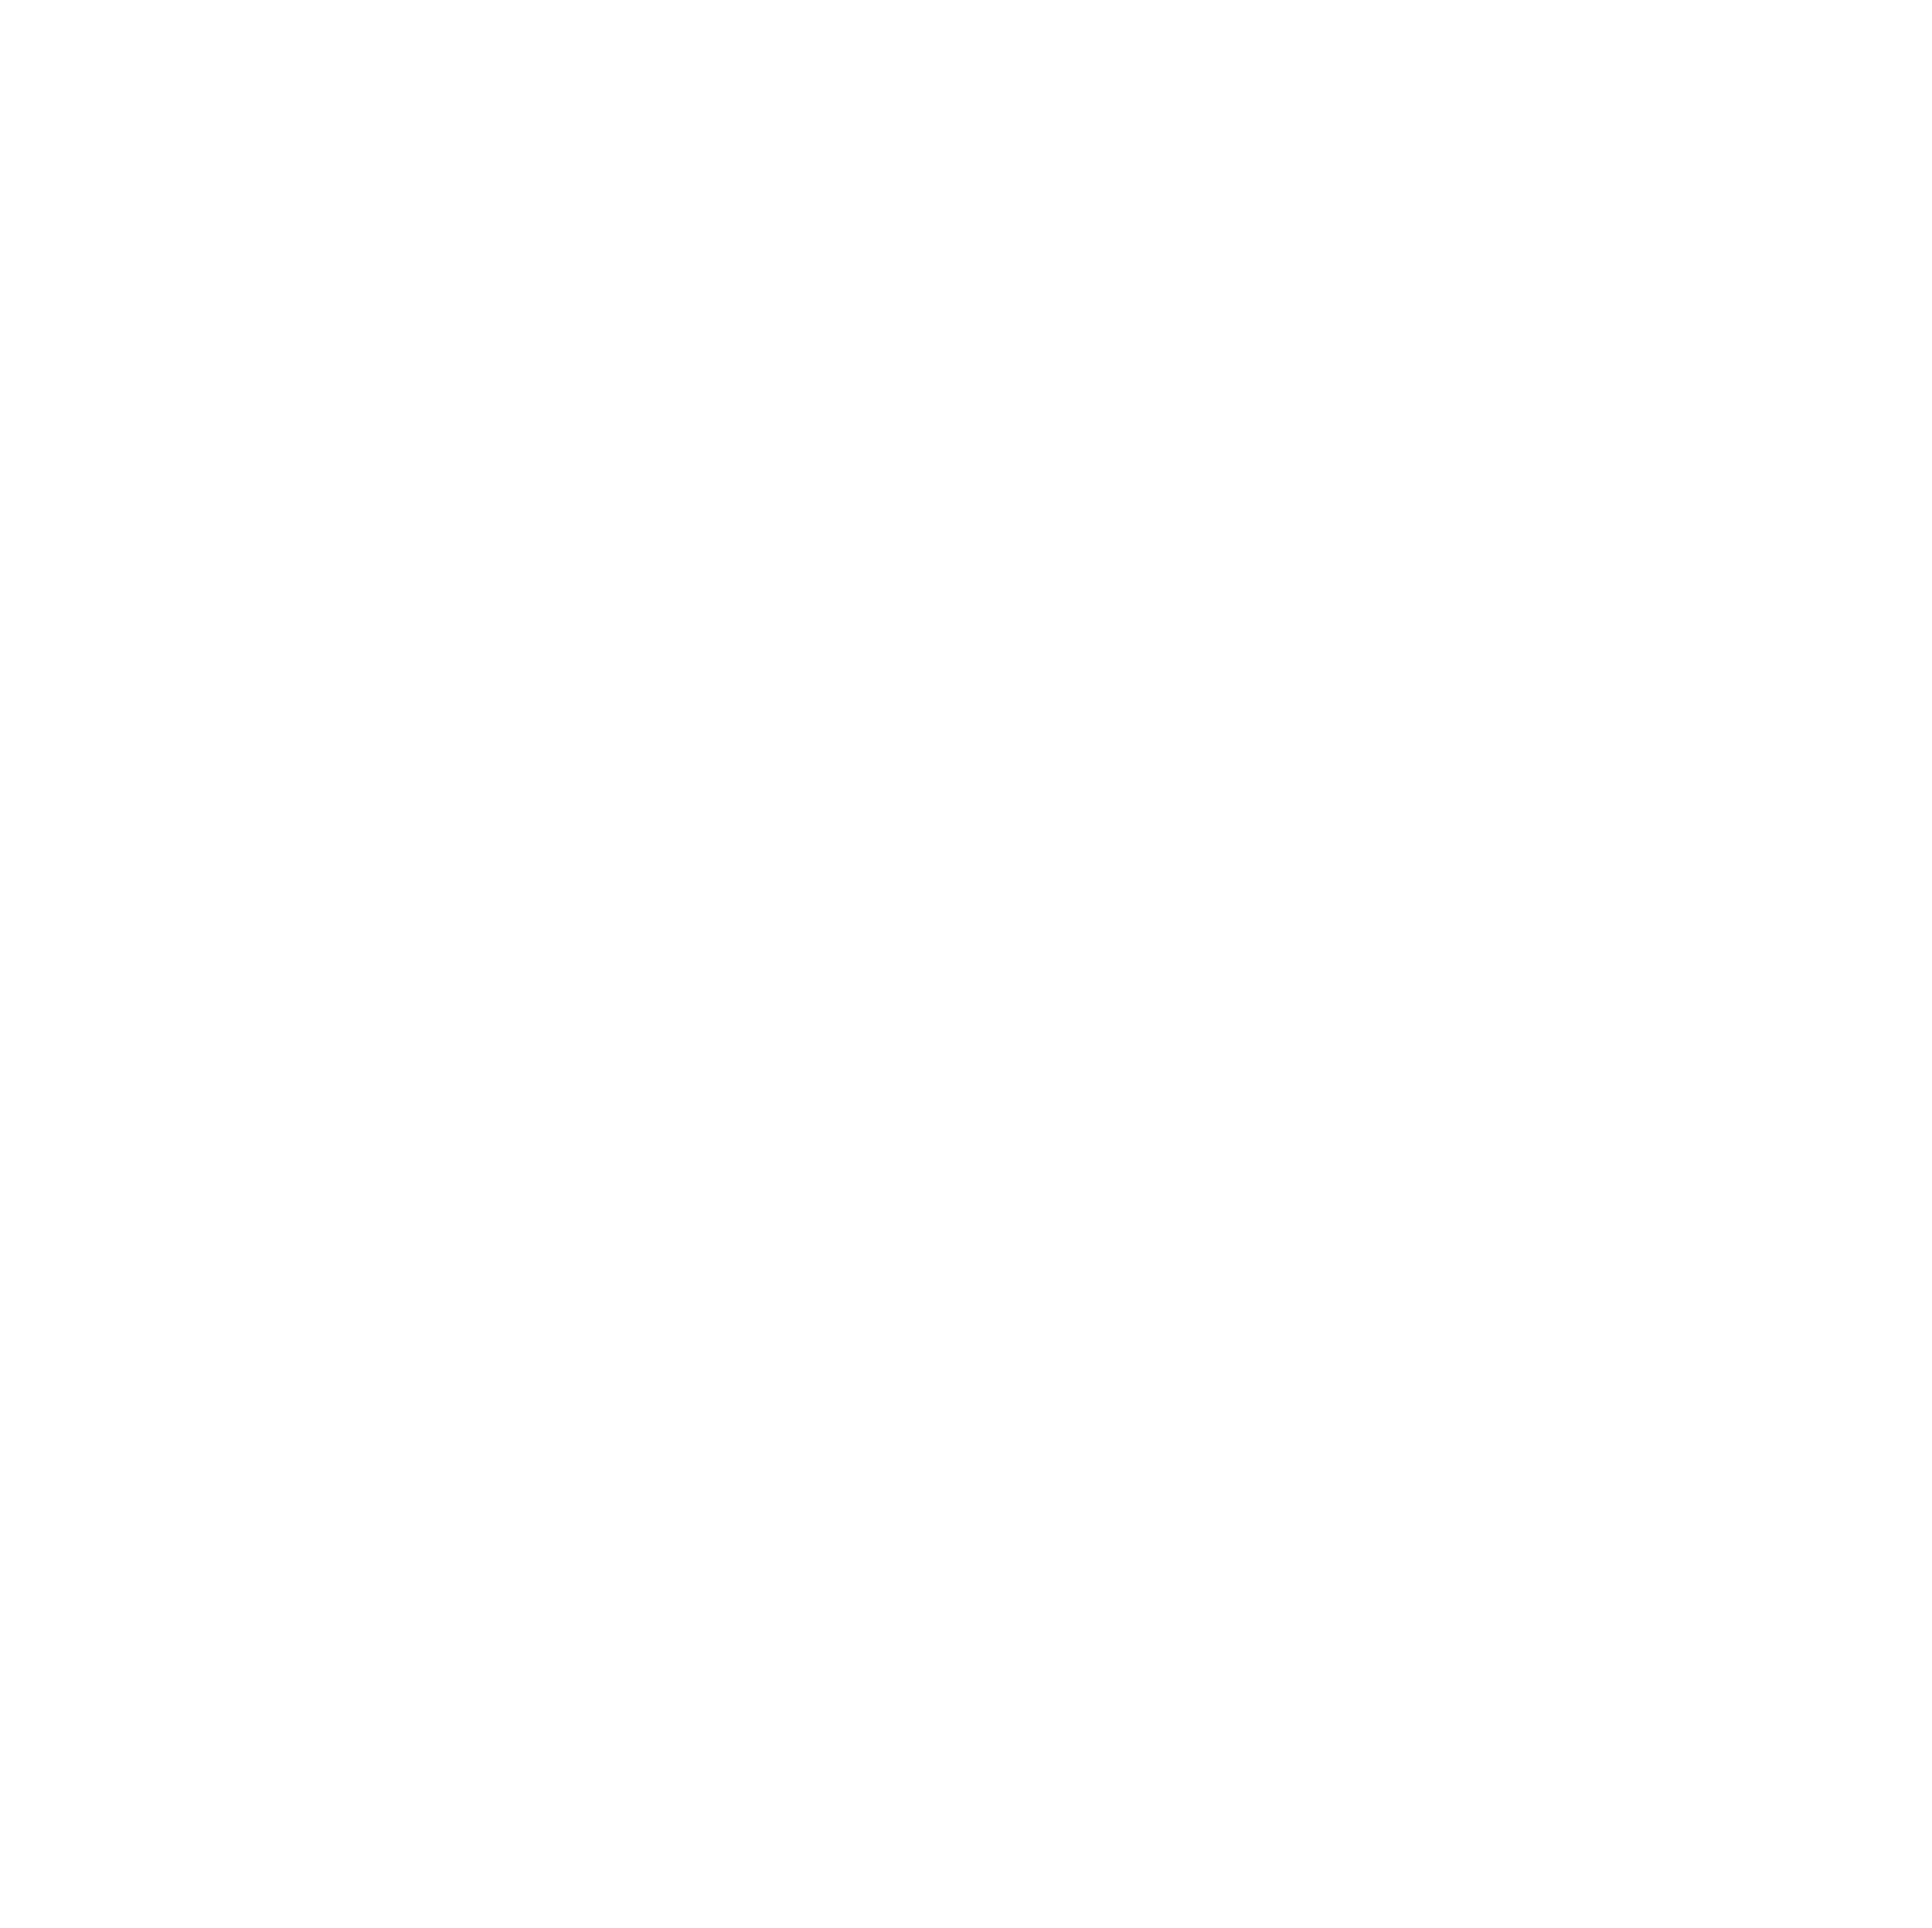 1_FBS